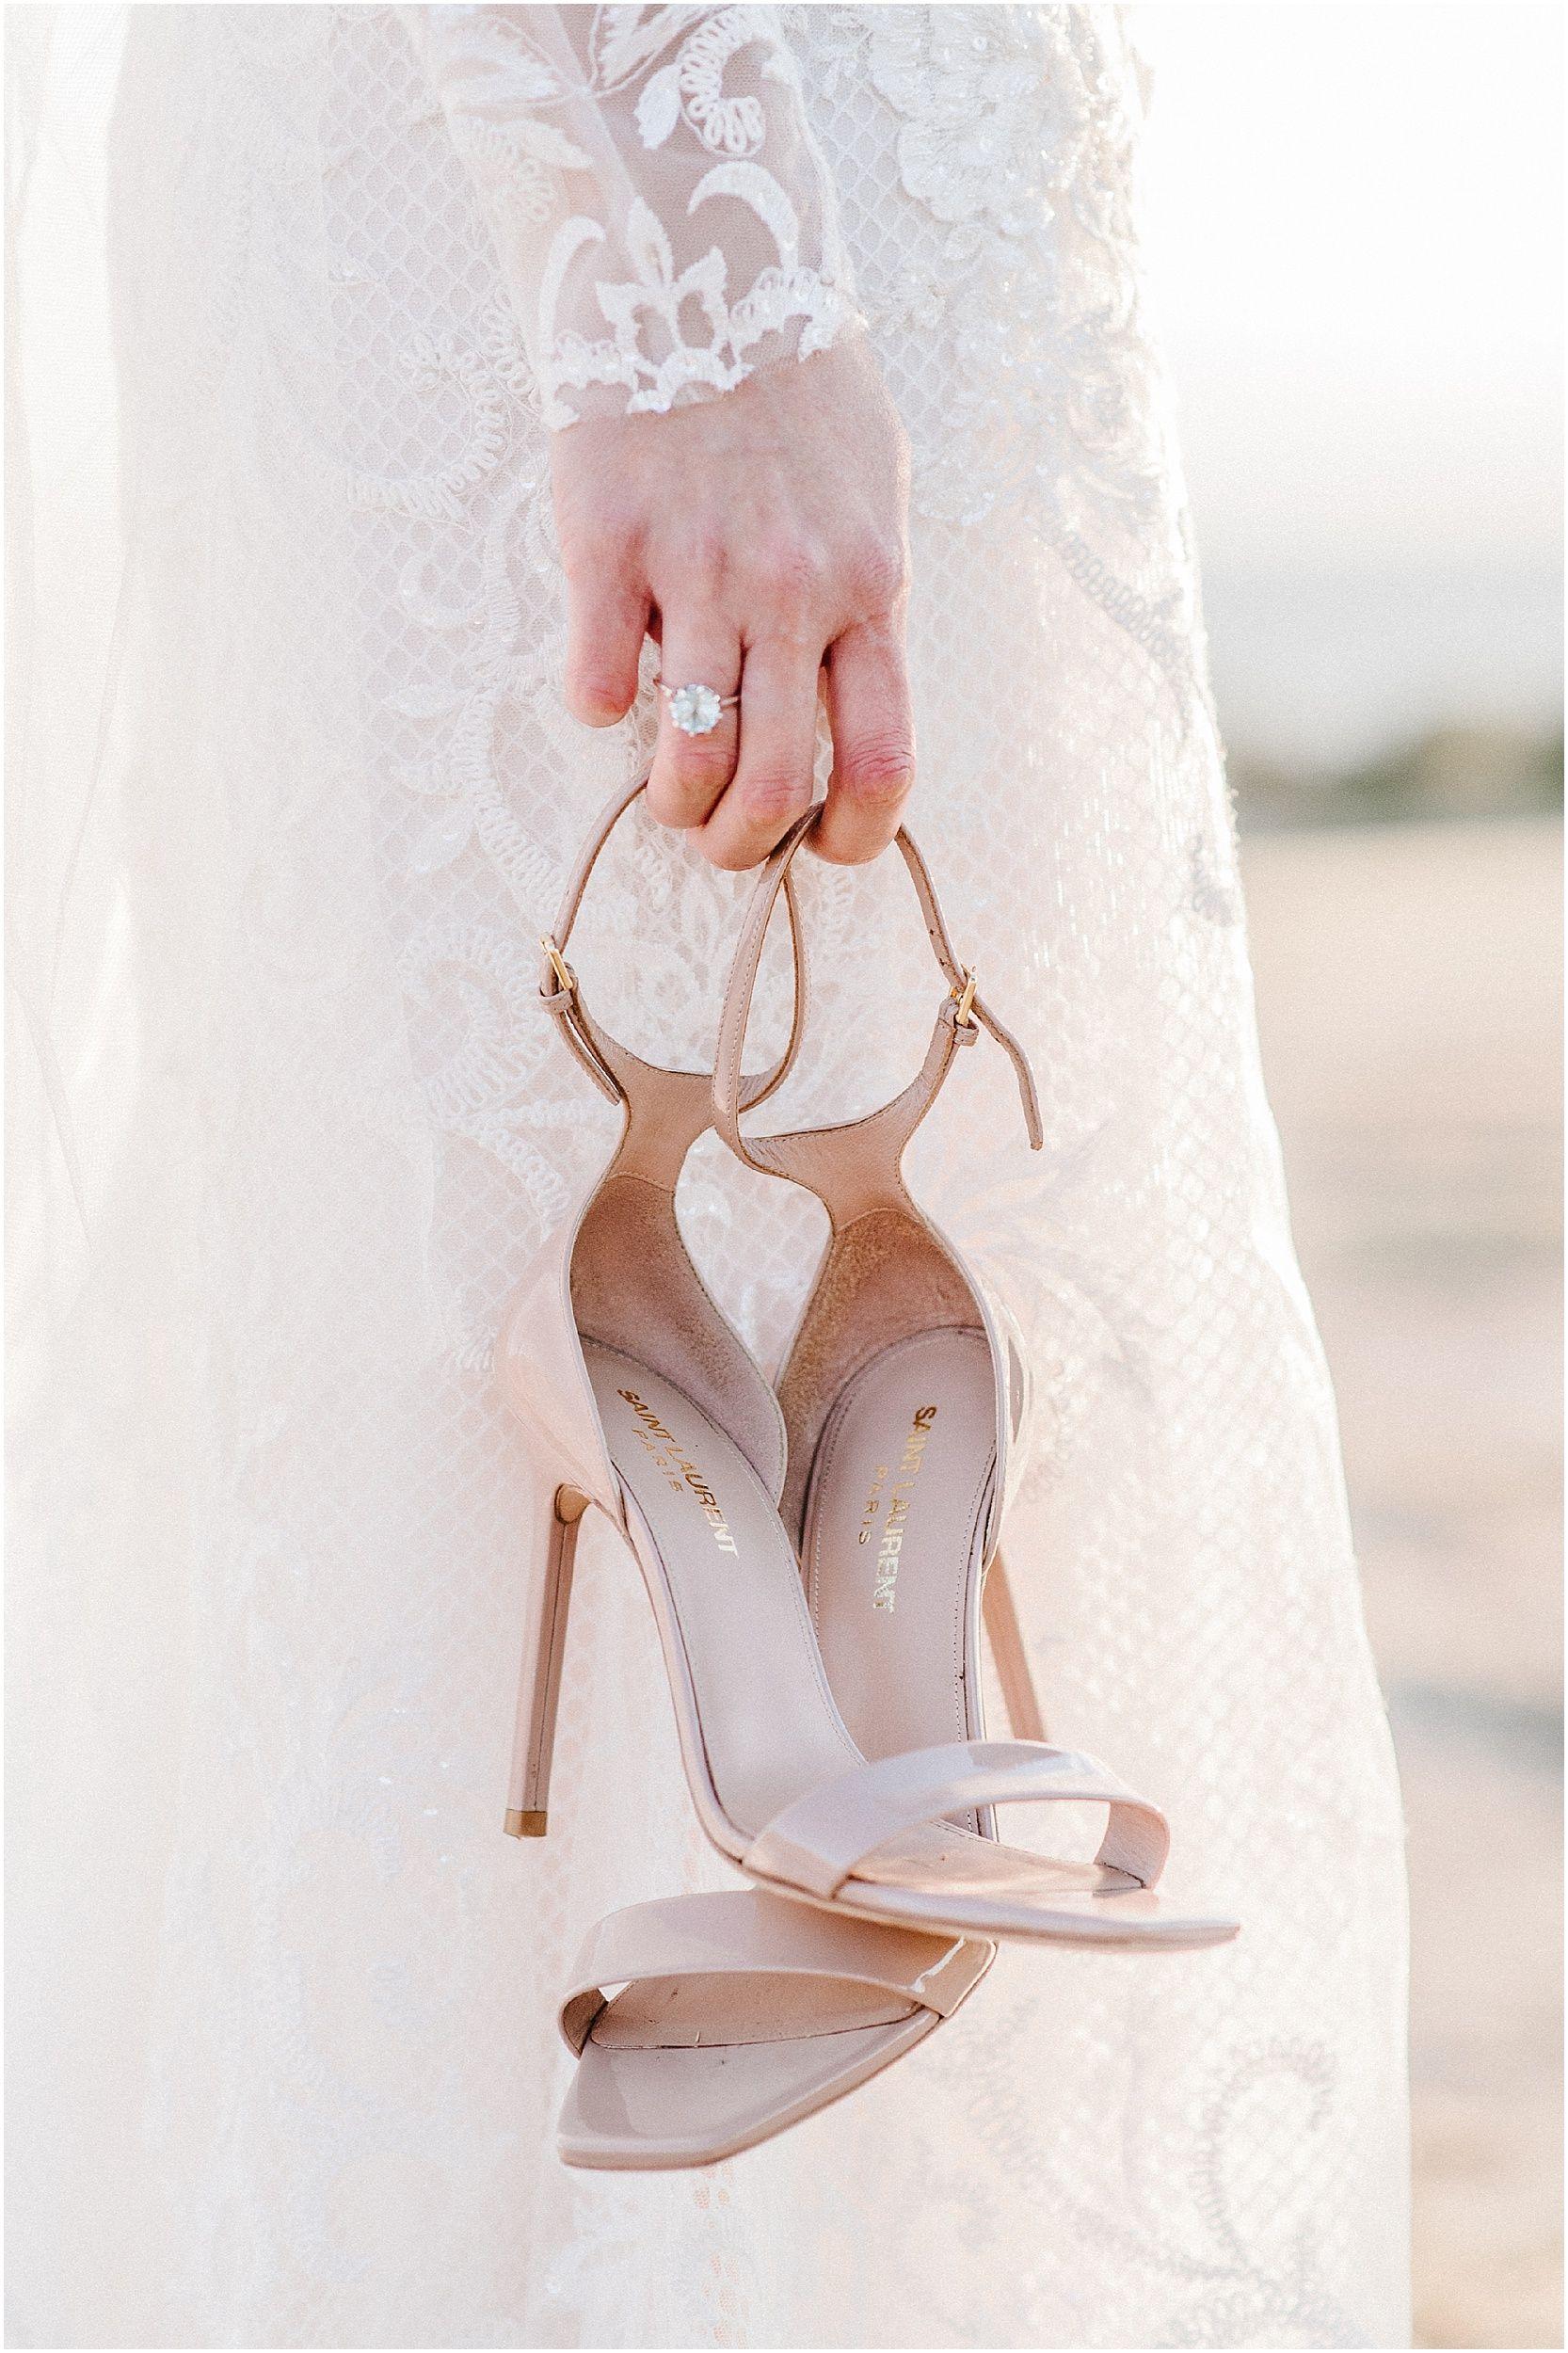 Red dress shoes for wedding  Nicole Jansma Photography Long Sleeve Lace Wedding Dress Rivini Rita